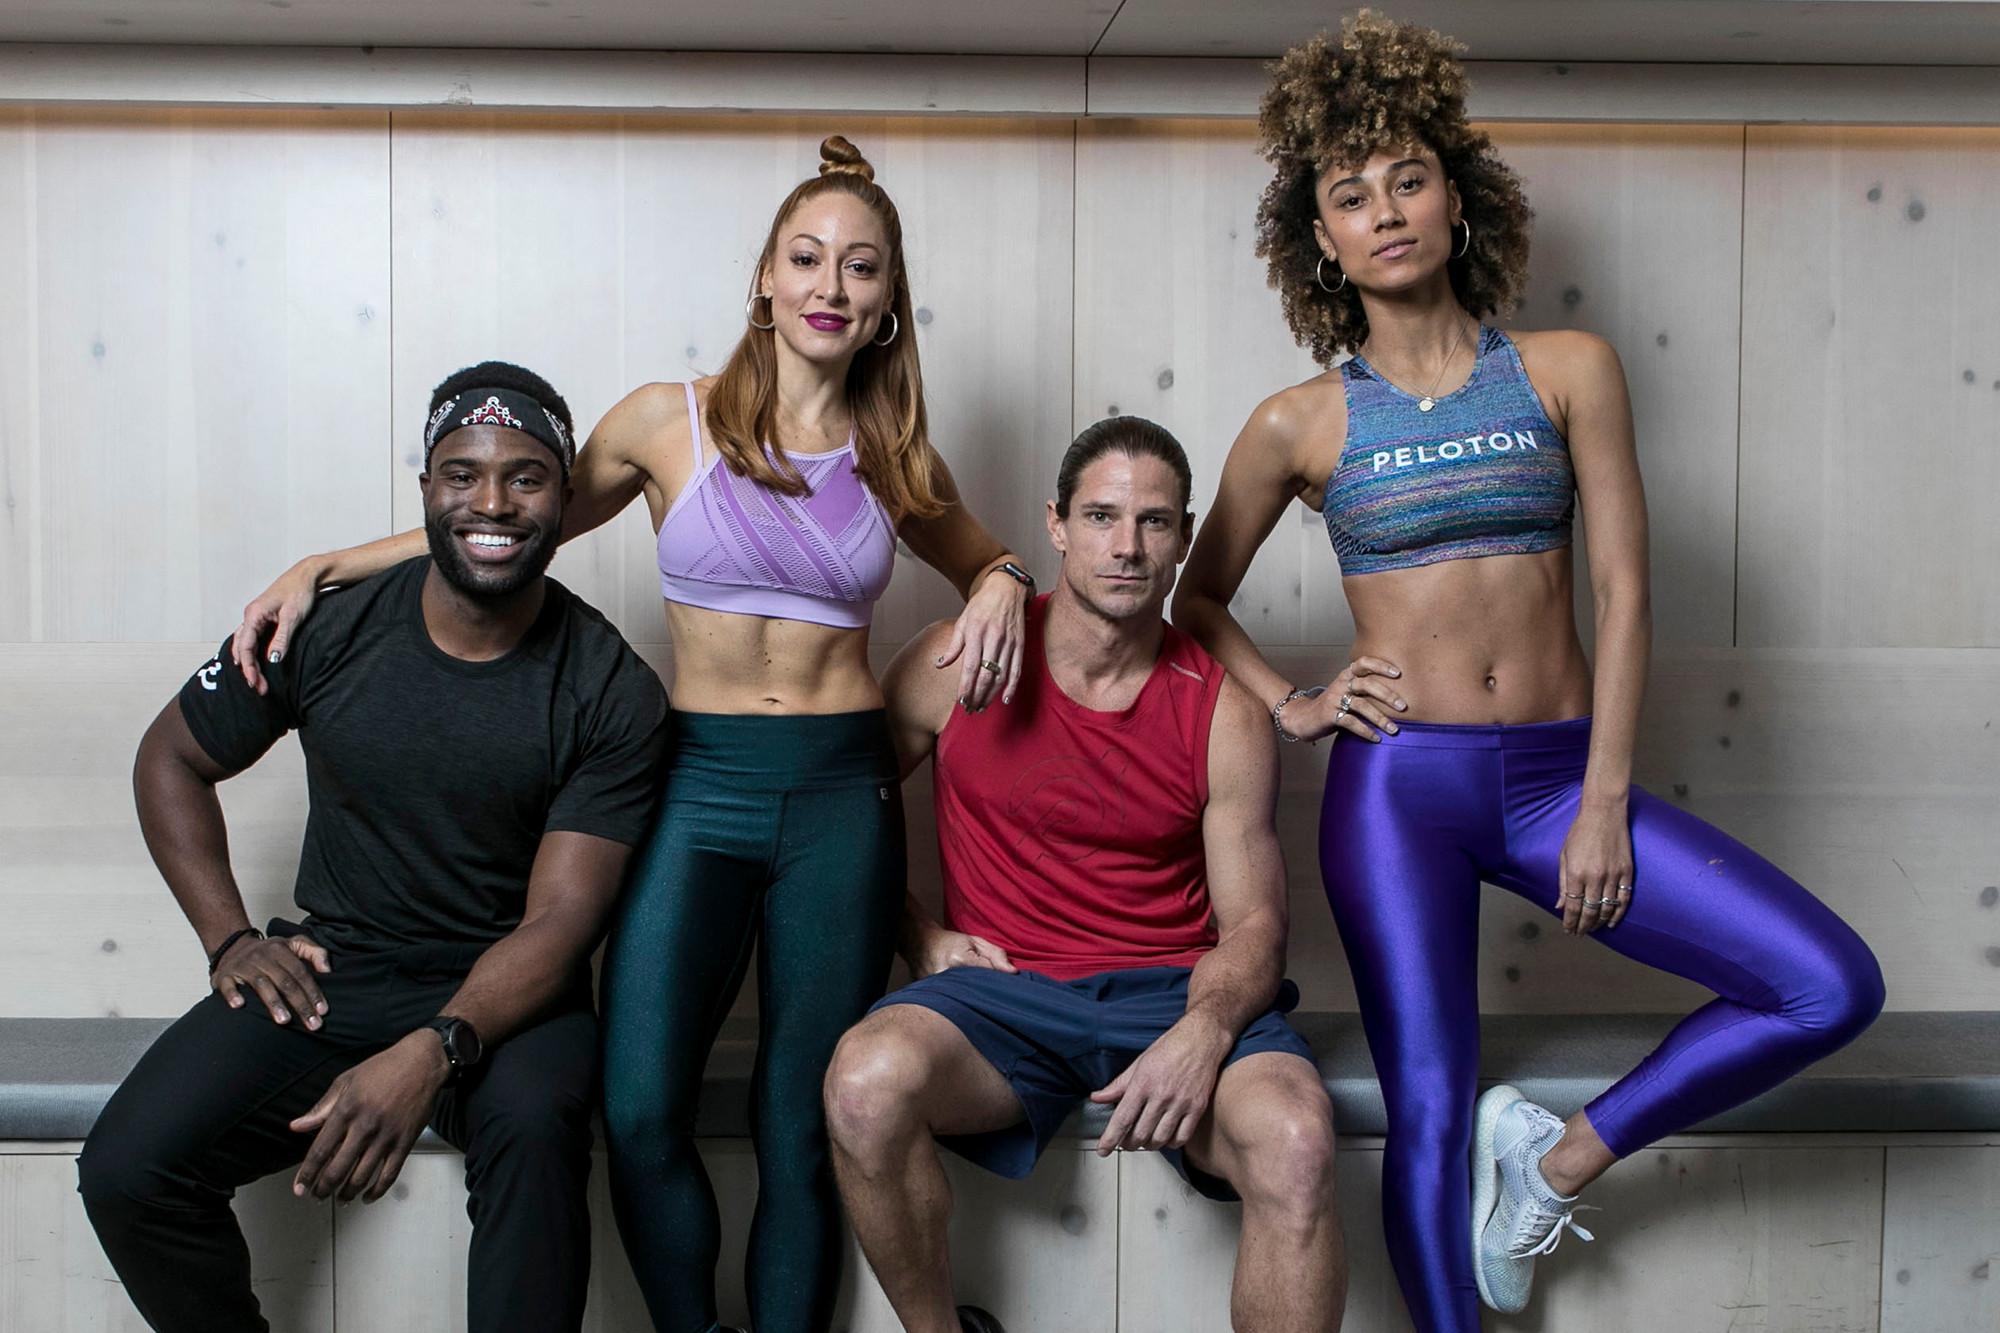 Meet the kickass Peloton instructors getting the world fit